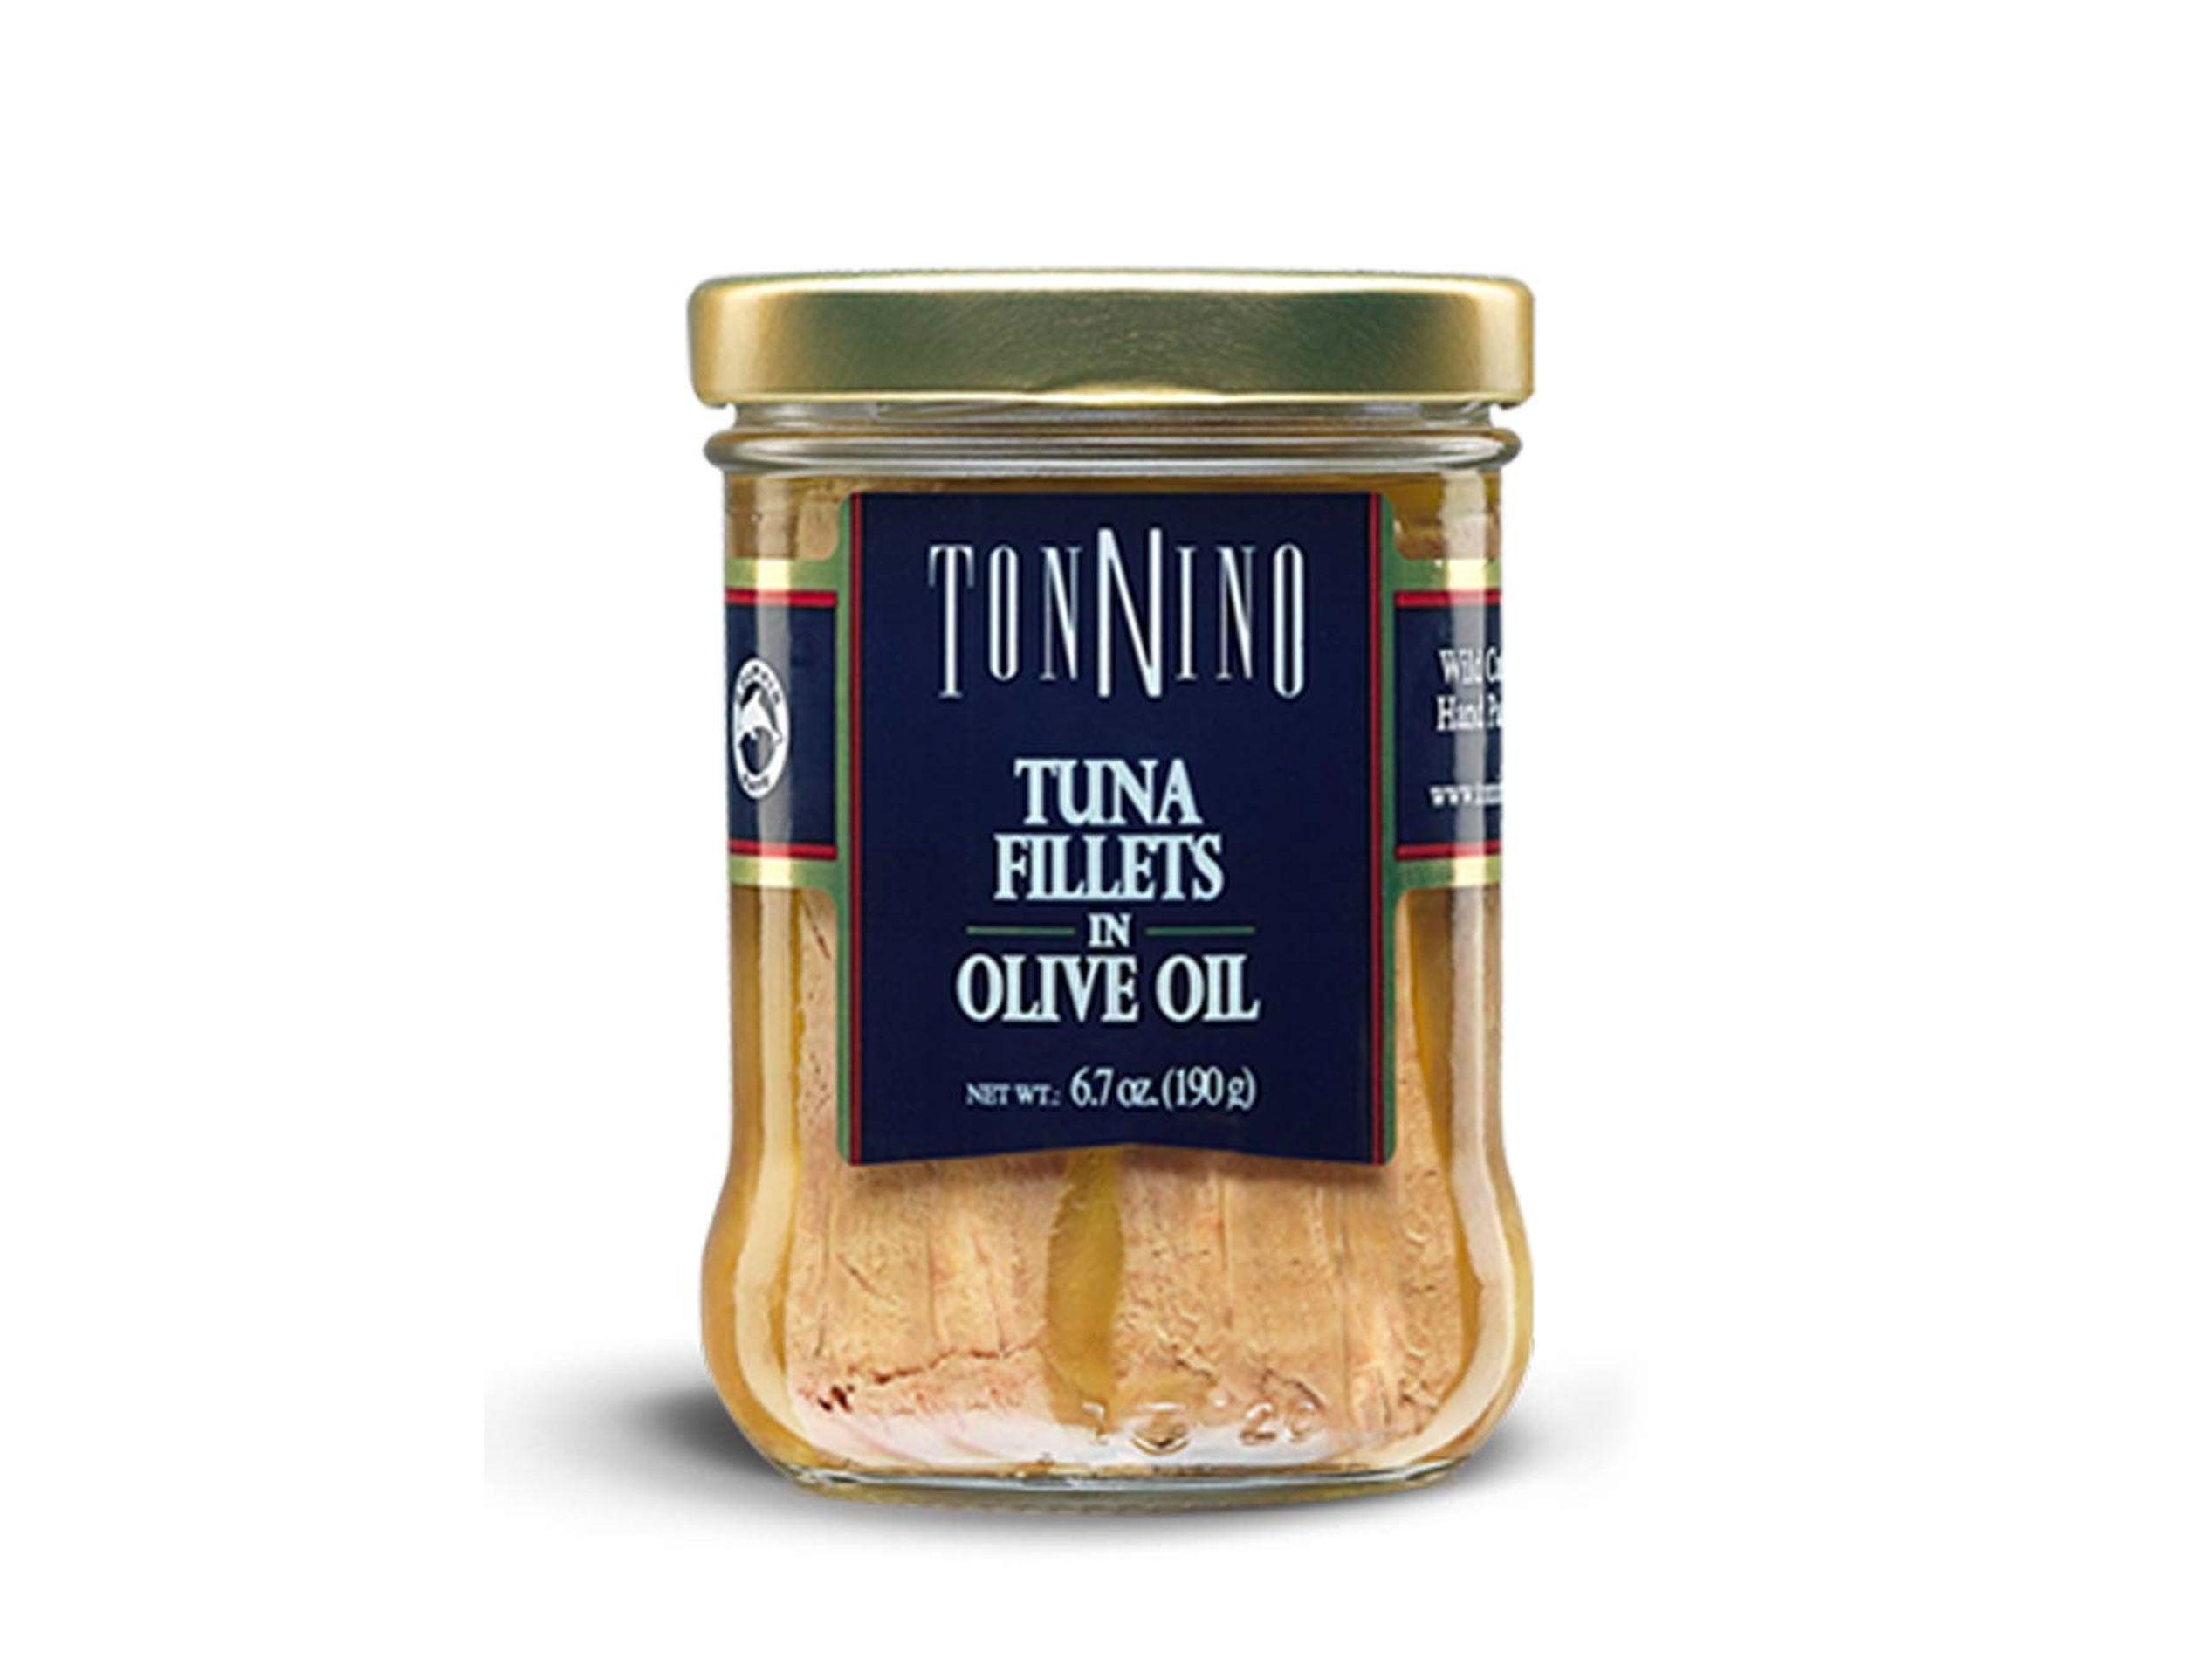 Tonnino Tuna Fillets Low Calorie and Gluten Free Yellowfin Jarred Premium Tuna in Olive Oil 6.7 oz